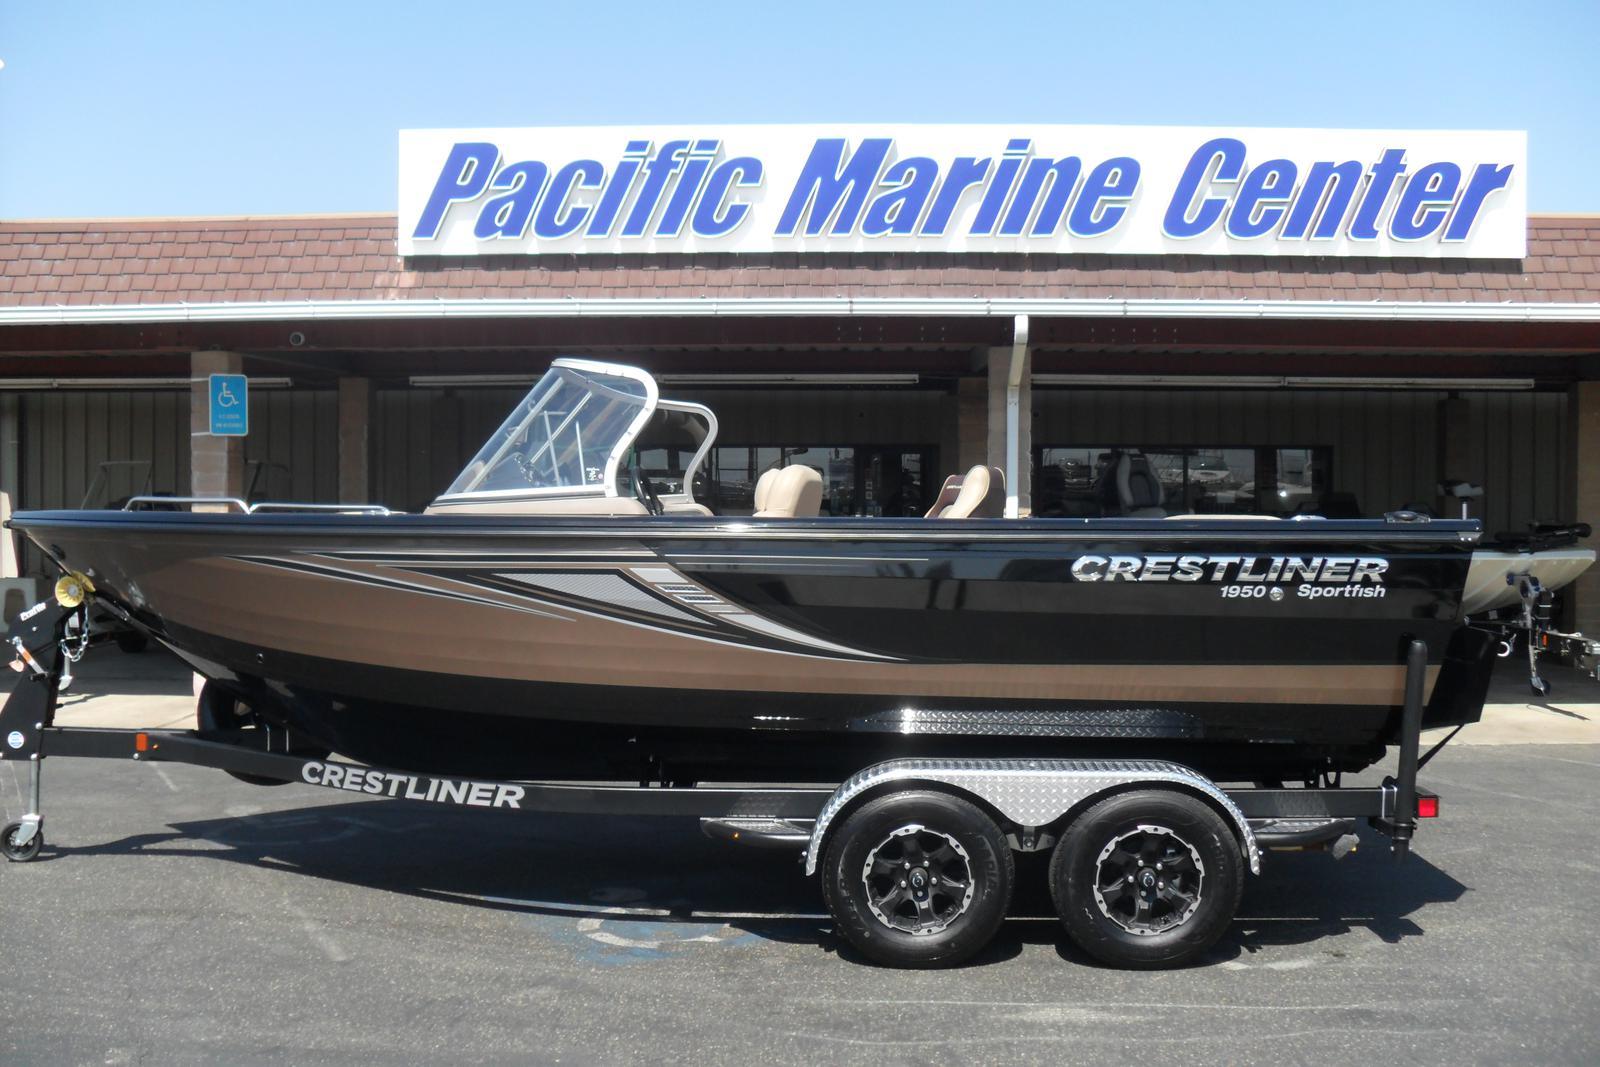 2017 Crestliner 1950 Sportfish Sst Mercury 225hp Verado For Sale In Wiring Harness Madera Ca Pacific Marine Center 559 432 2277